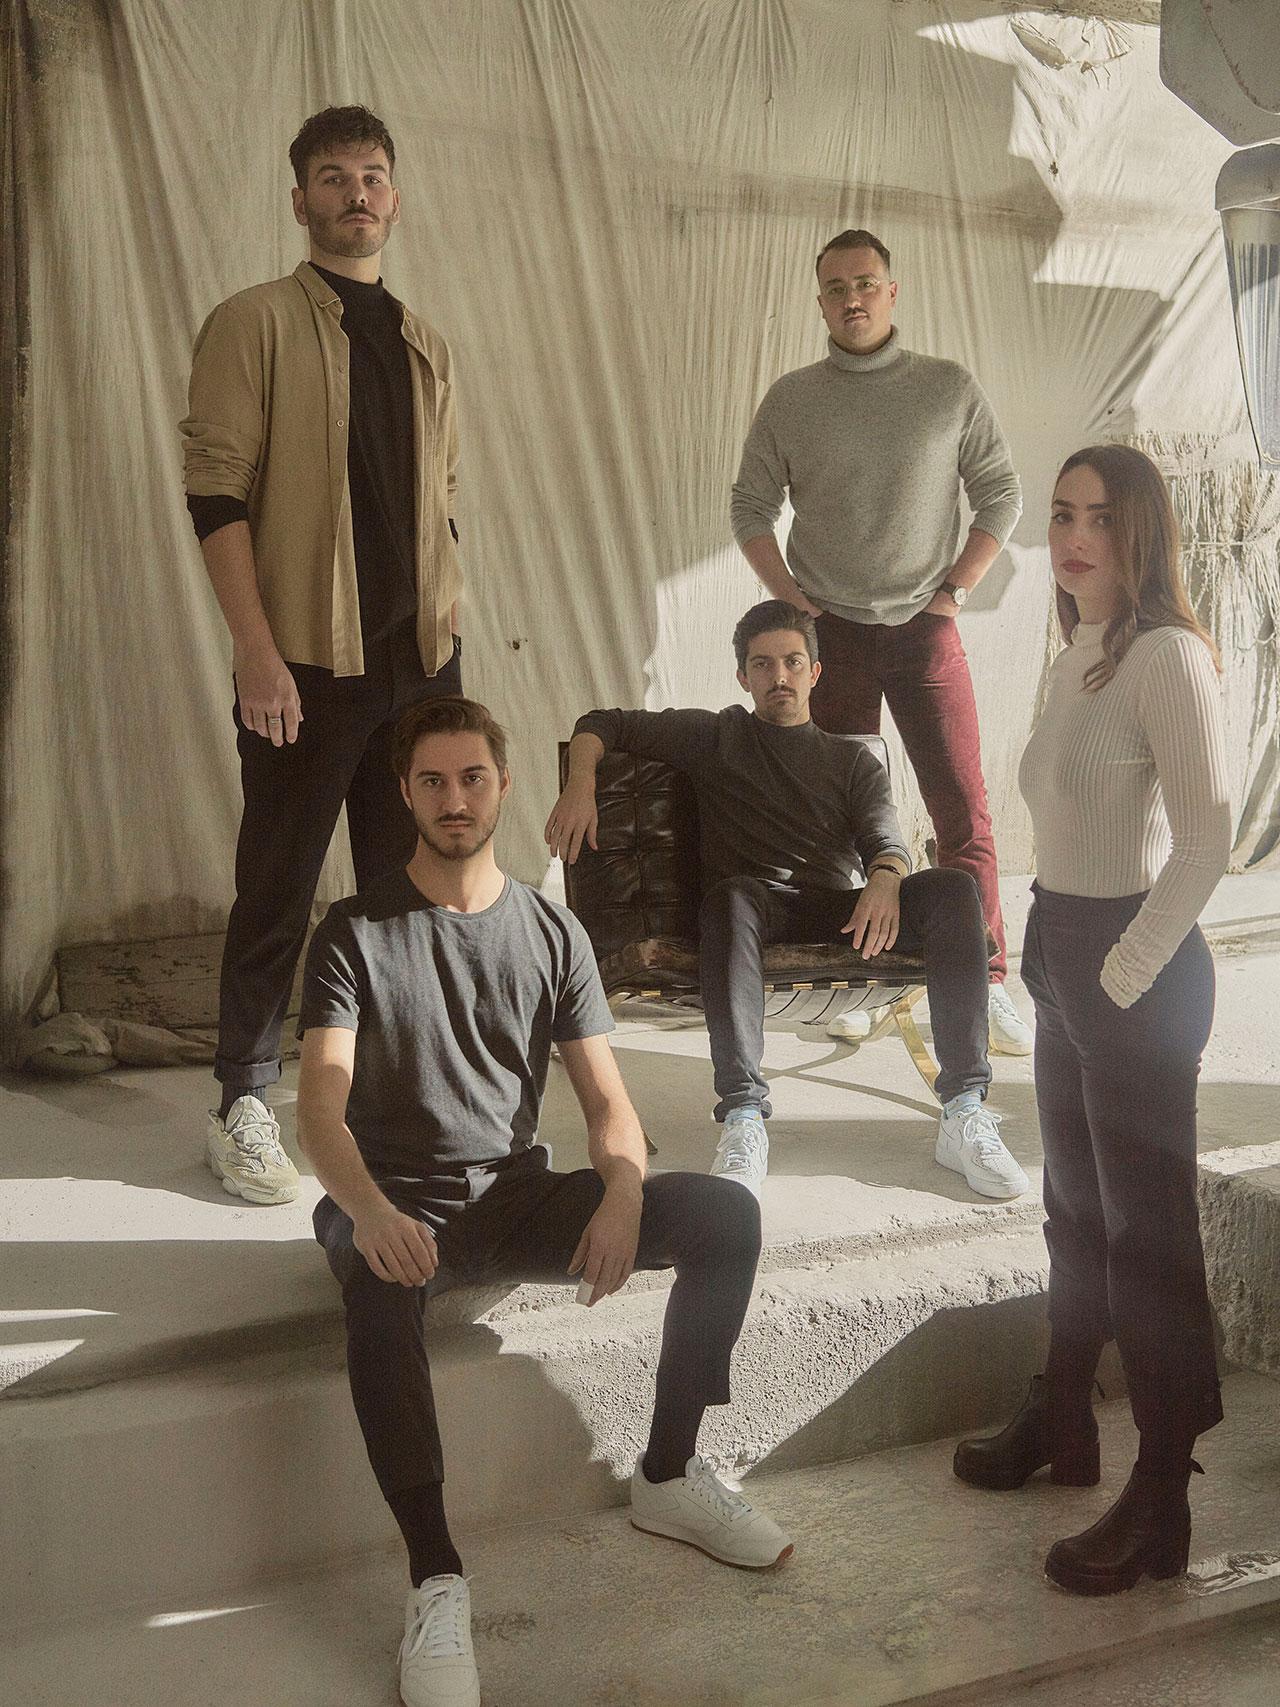 IVY STUDIO team. Photography byMathieu Fortin